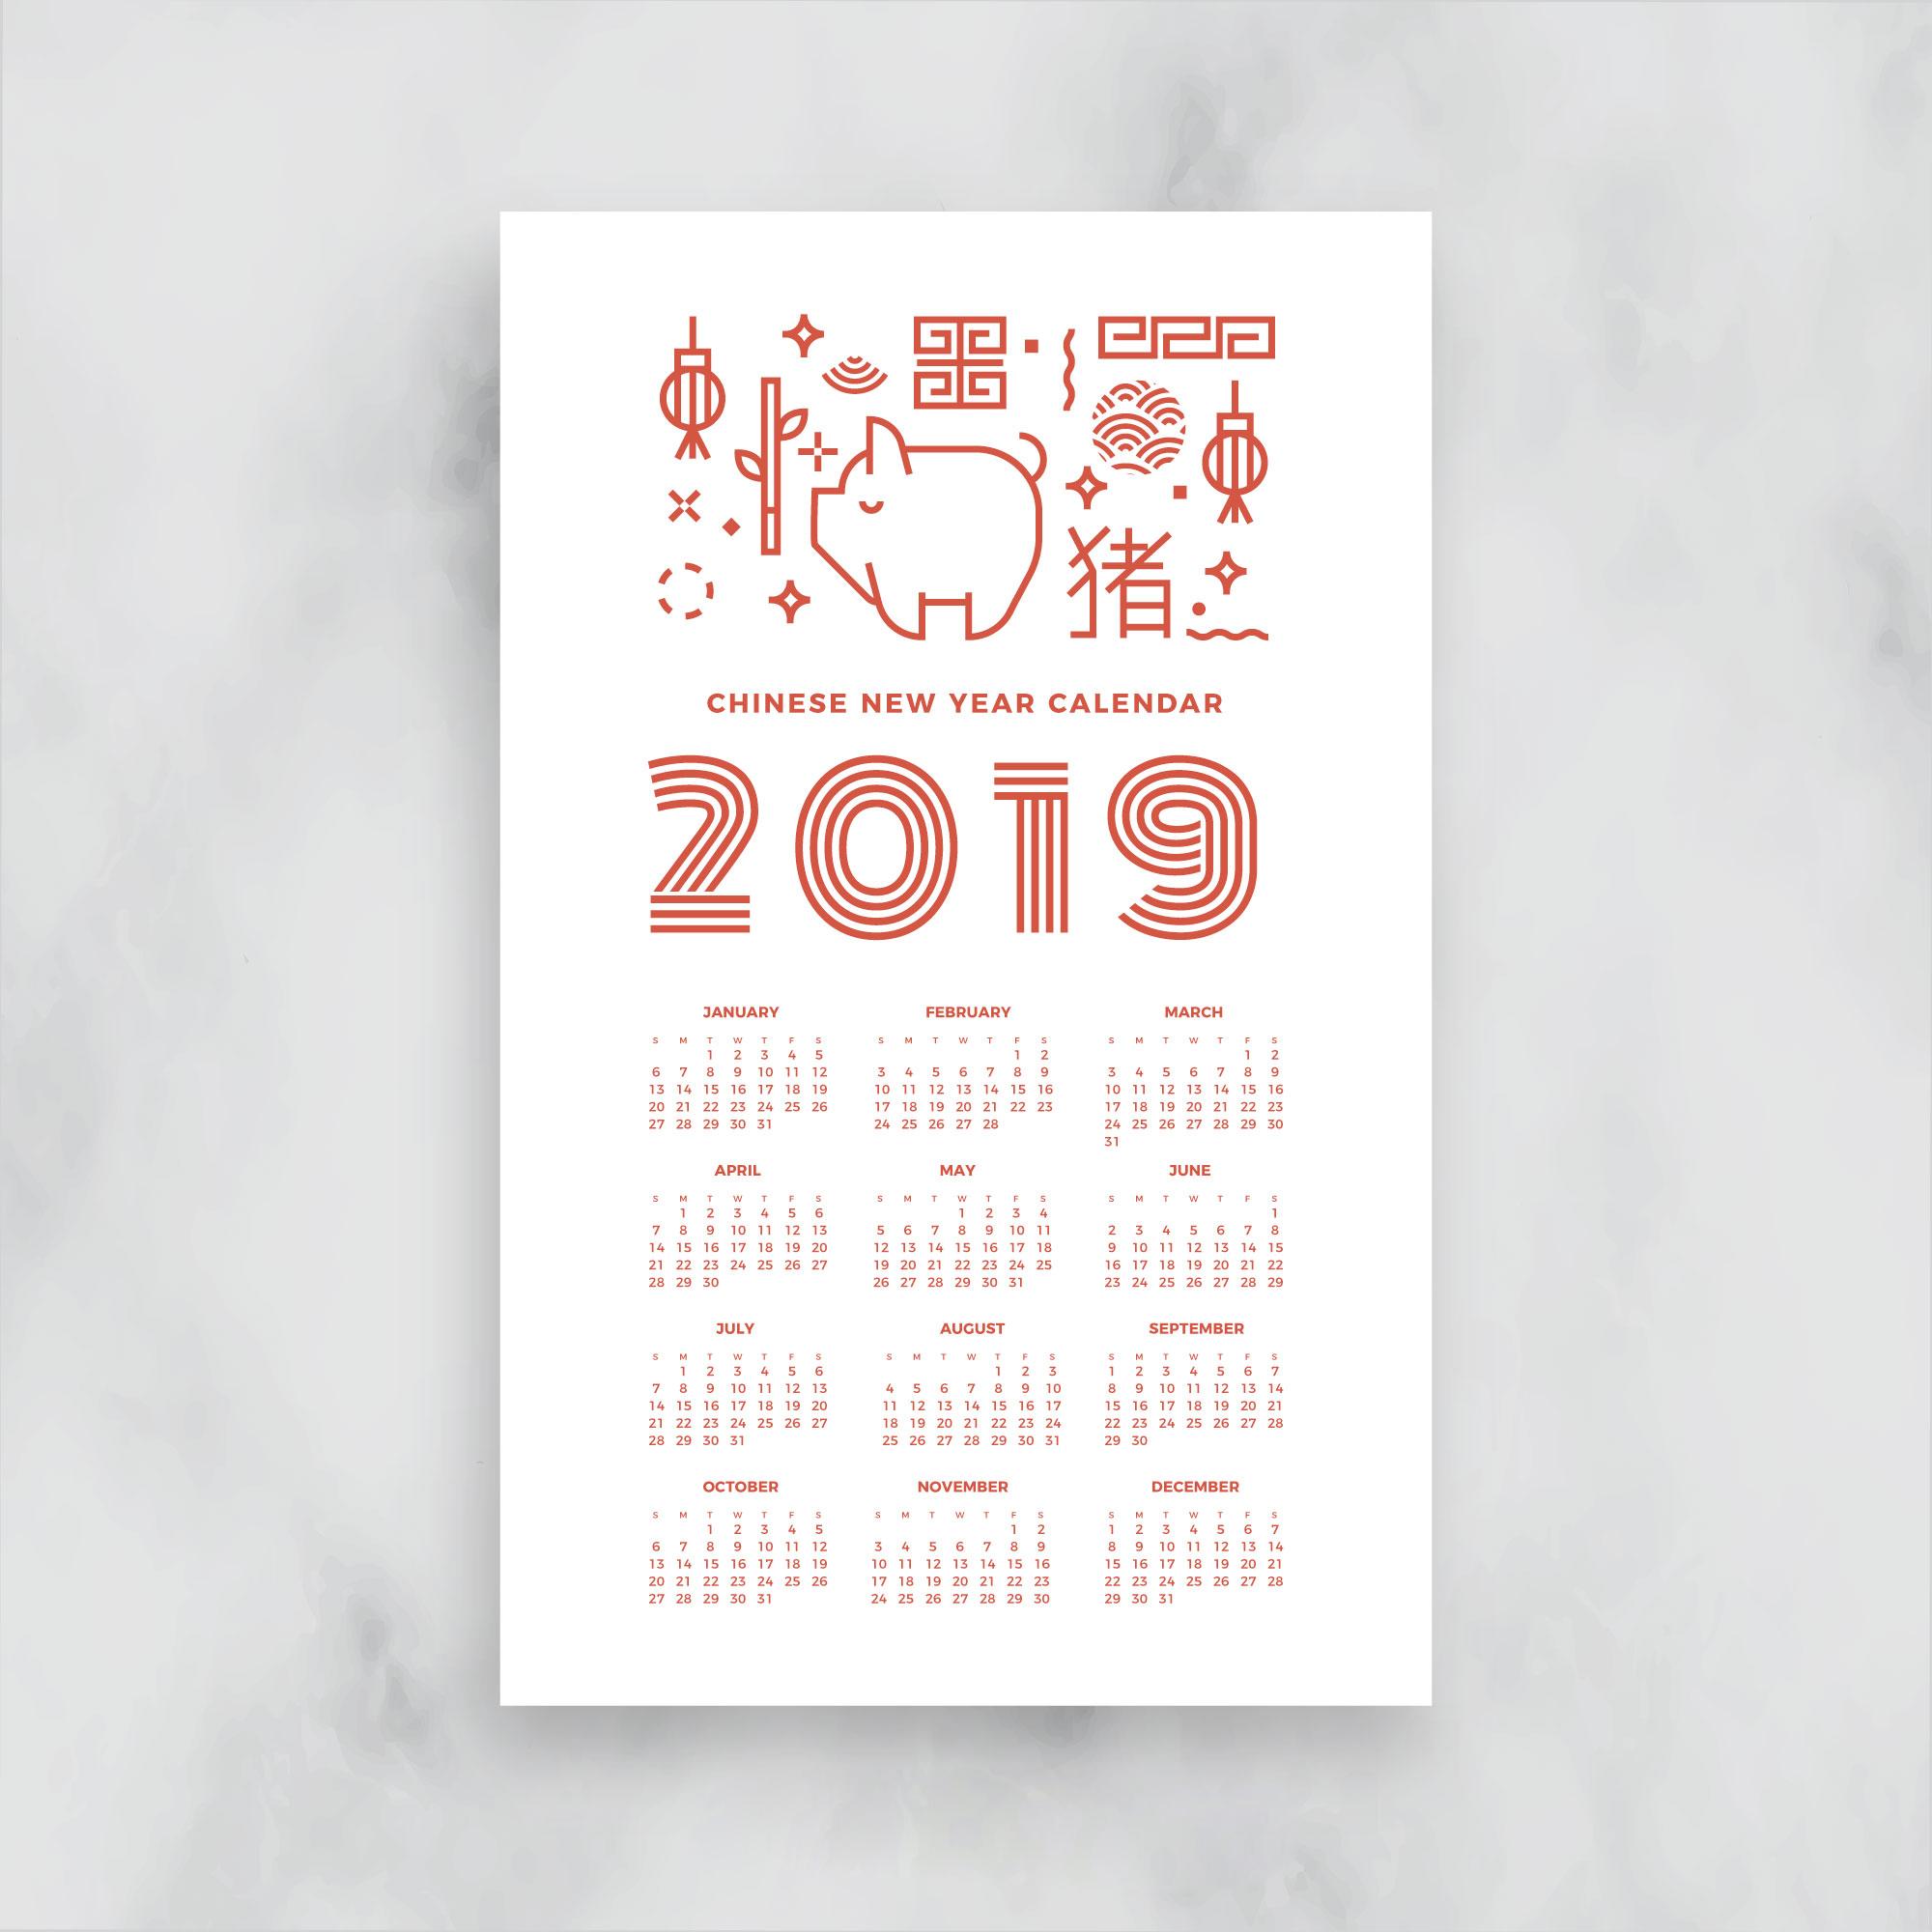 时尚简约的2019新年挂历日历矢量素材模板 Stylish Minimalist 2019 New Year Calendar Calendar Vector Material Template插图(2)